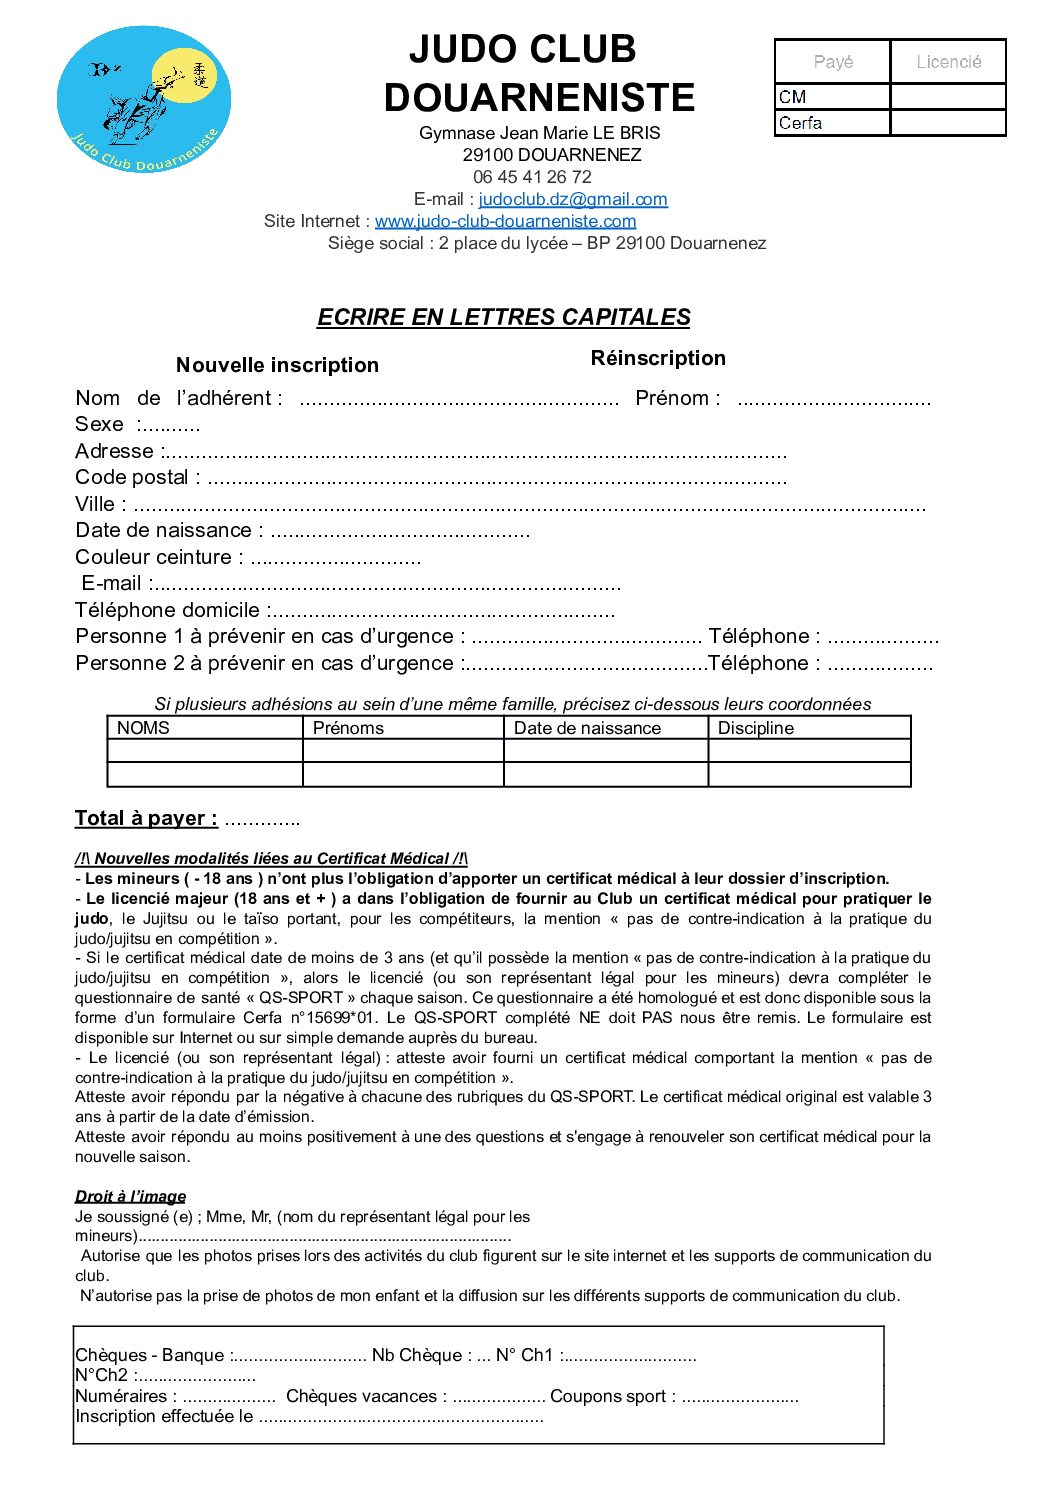 fiche inscription 2021 2022 1 pdf - Accueil